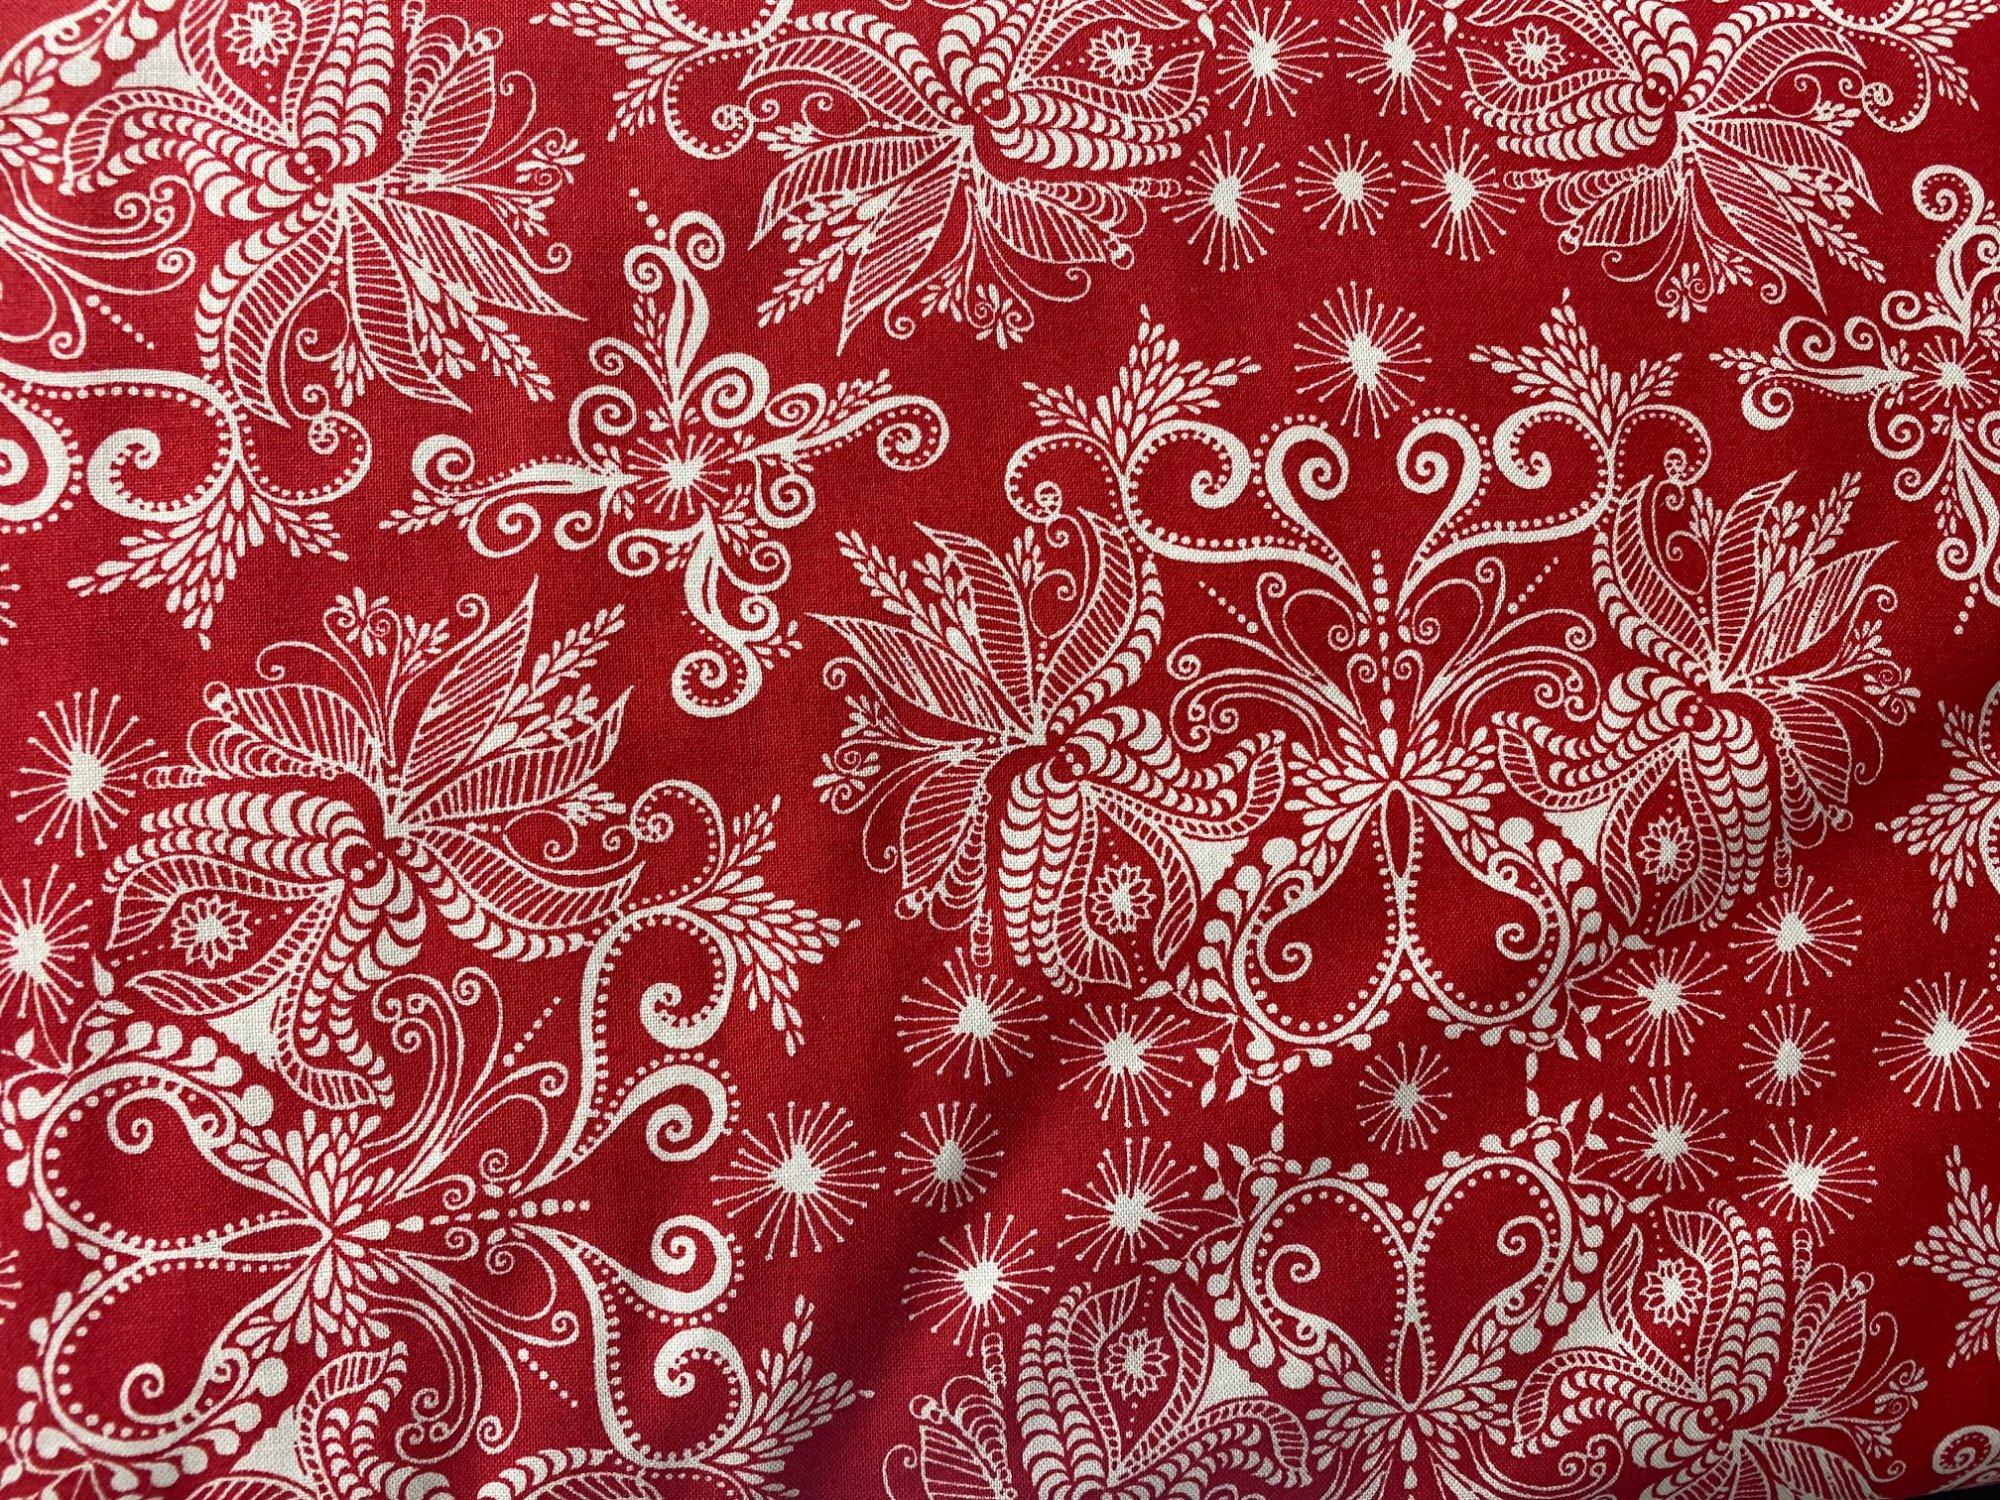 Choice fabrics ZD-57423-003 red Christmas fern